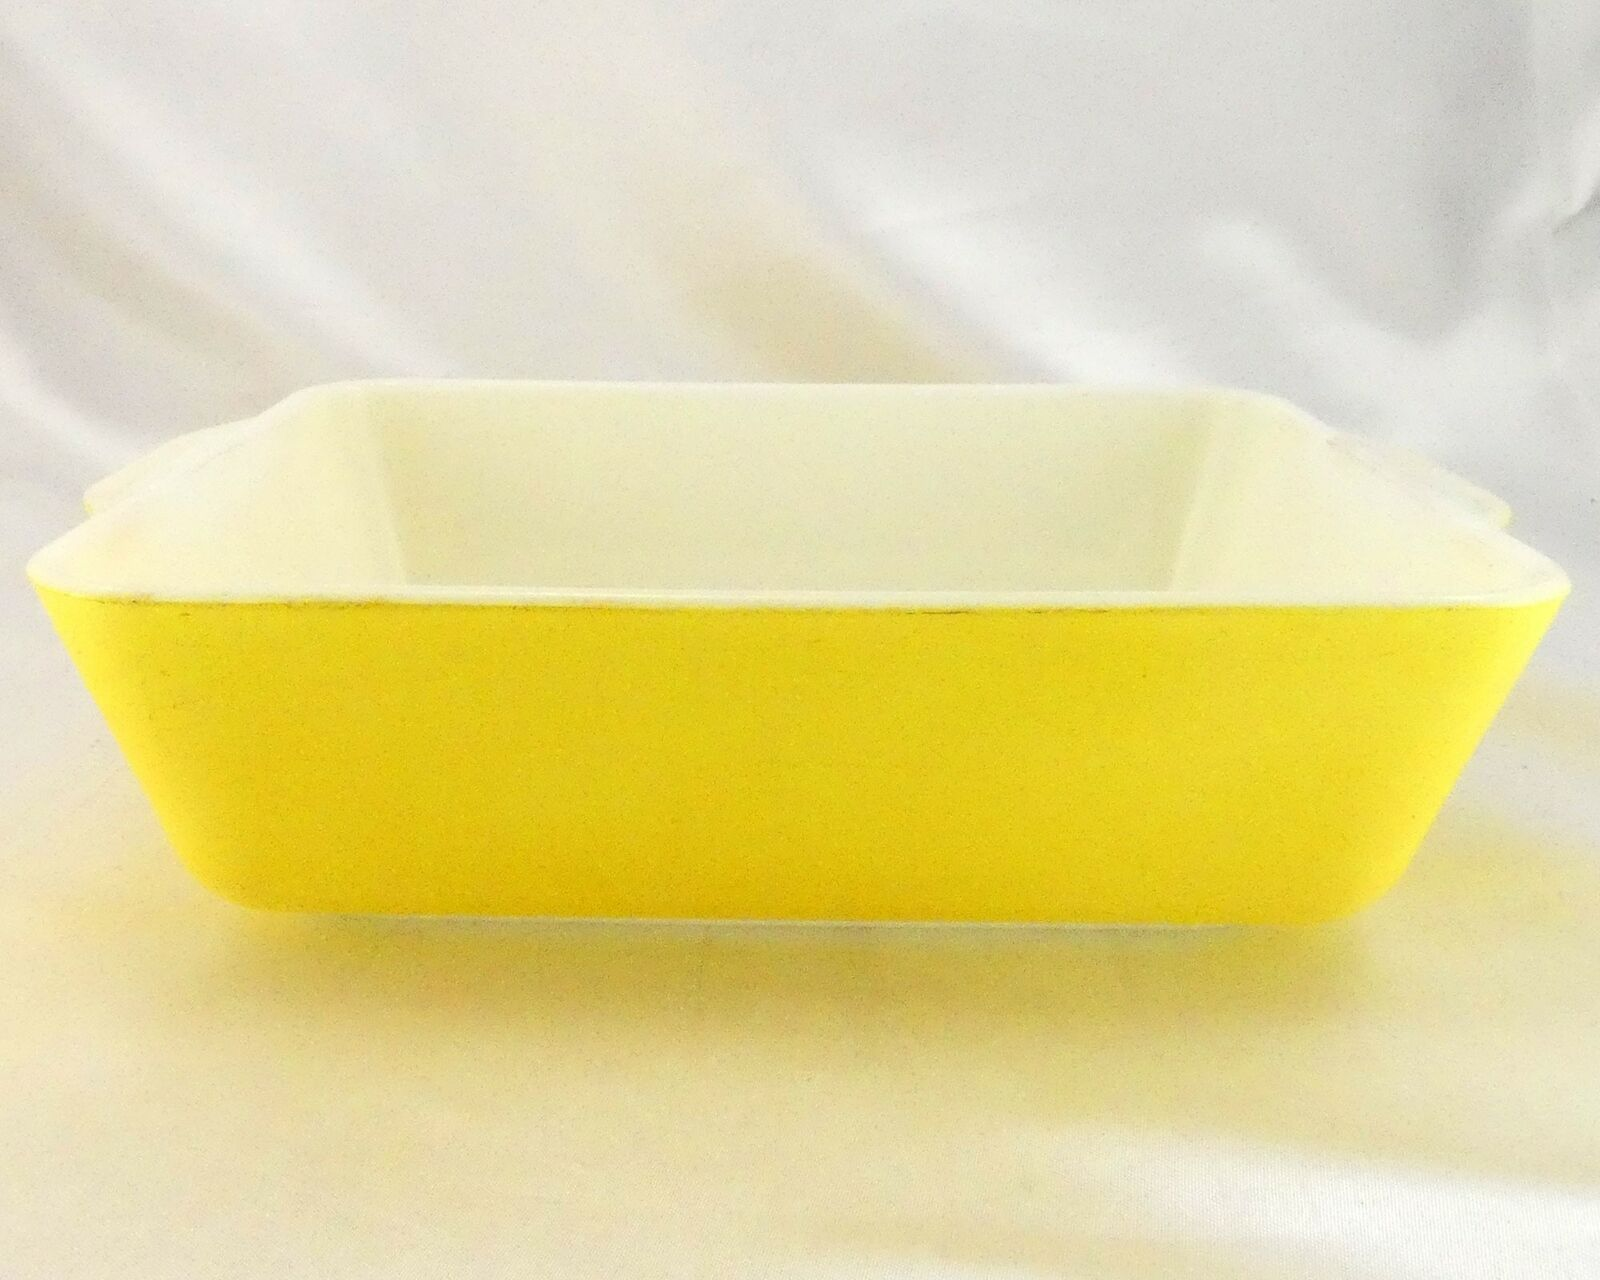 Pyrex 503 Banana Yellow Fridge Dish Milk Glass w/ Lid Made in the USA image 6